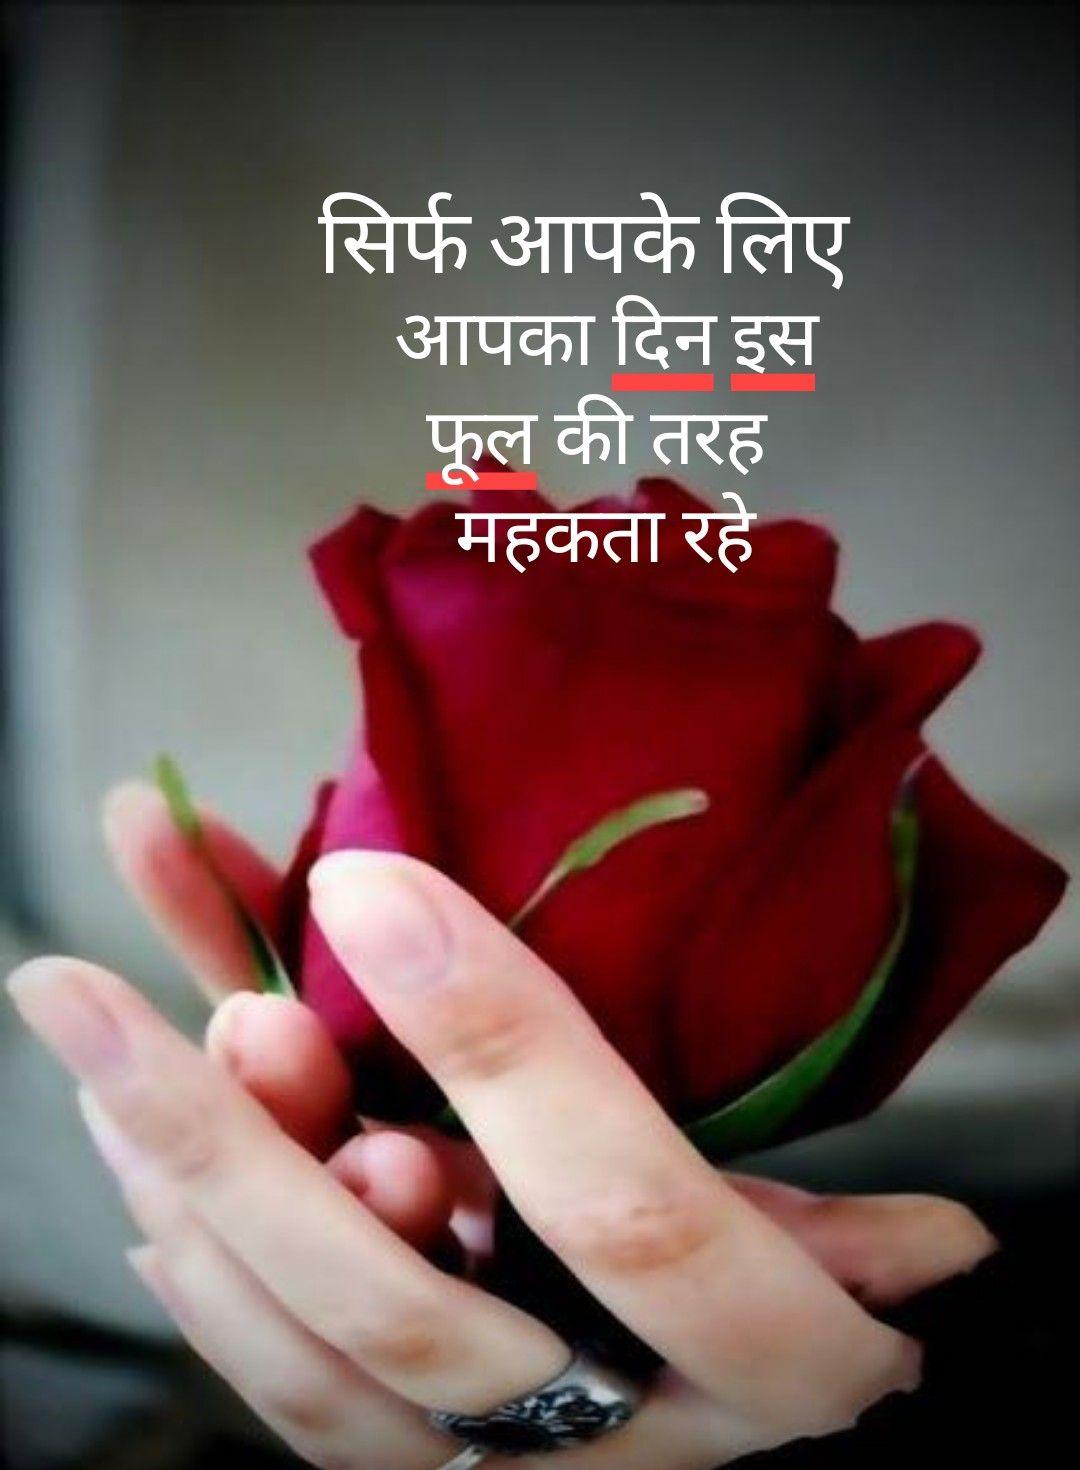 Pin By Pravin Meshram On Pvn7 Good Morning Quotes Hindi Good Morning Quotes Morning Quotes